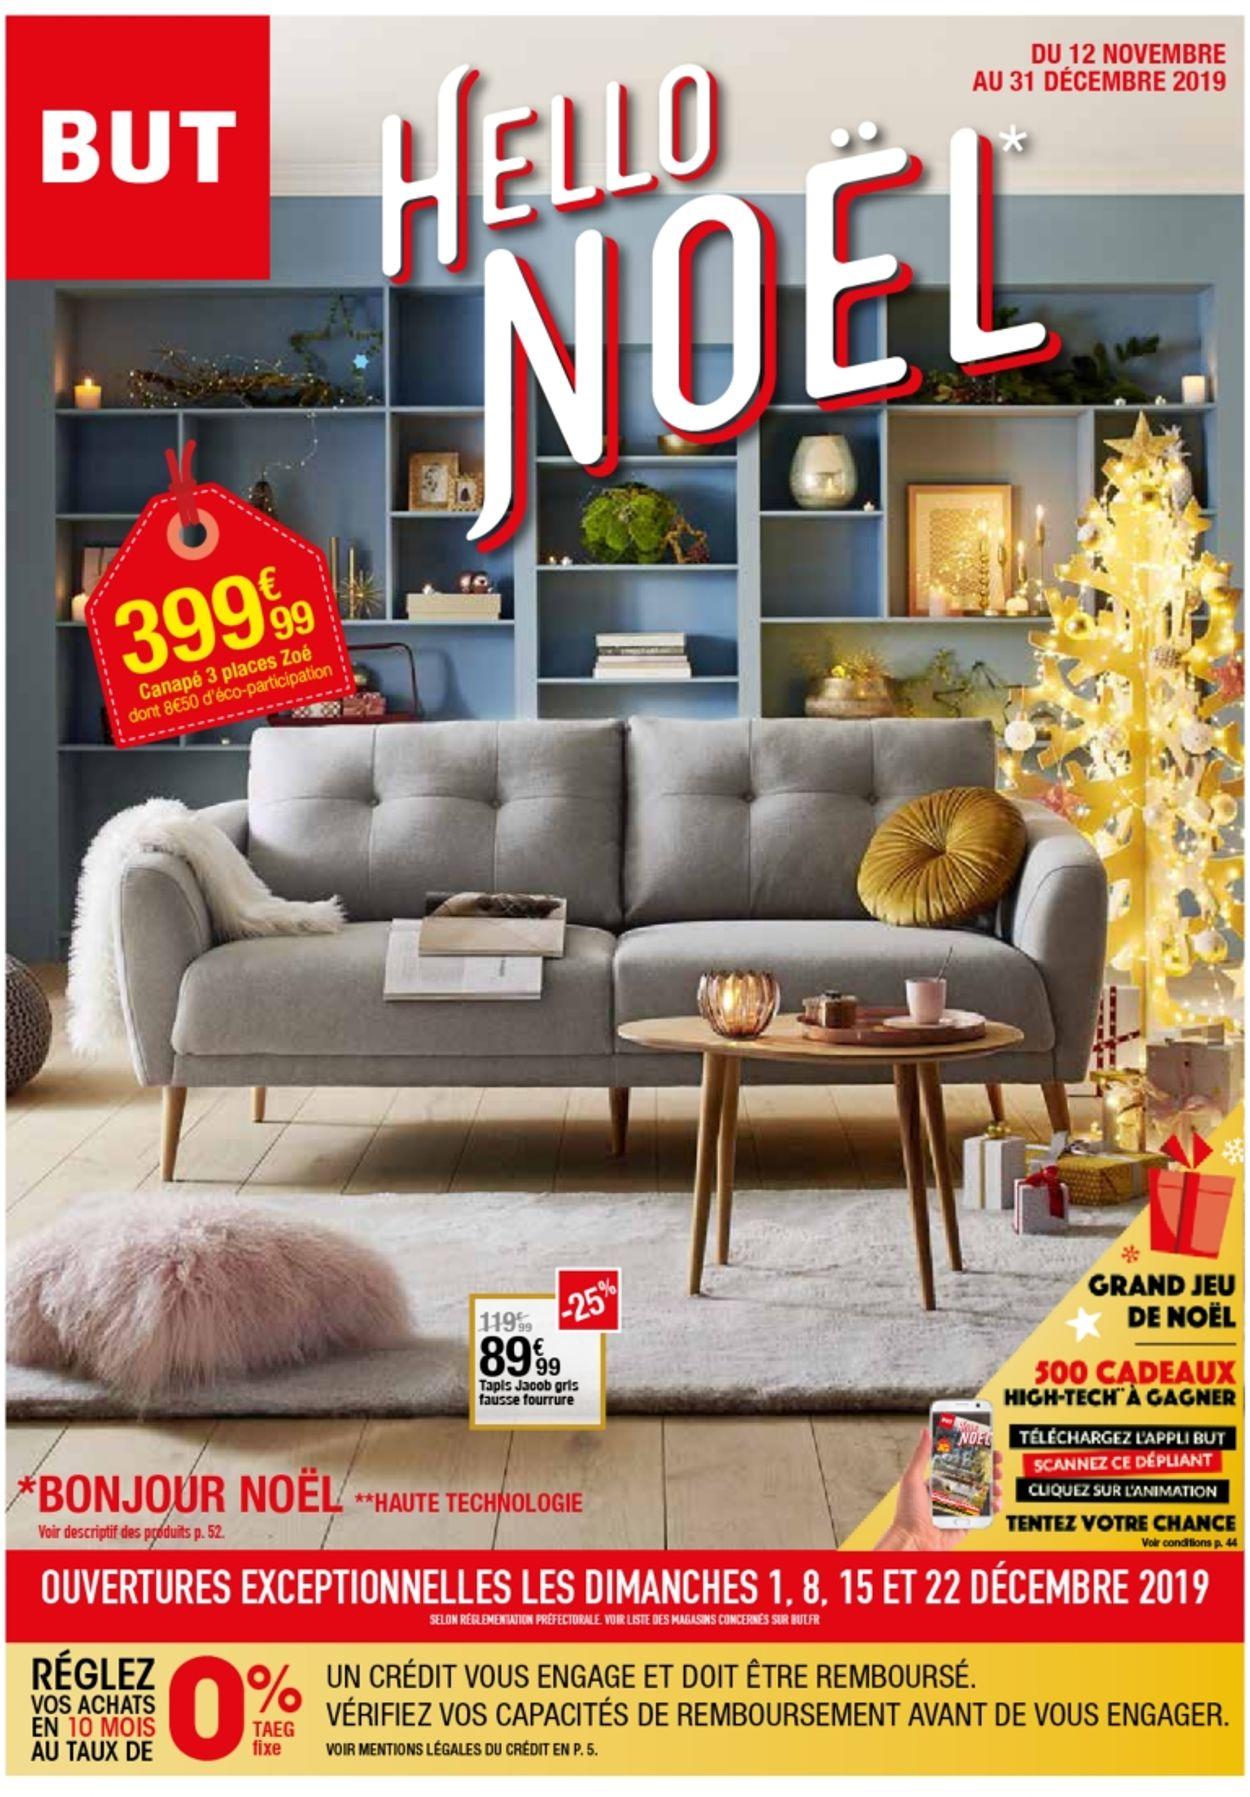 But catalogue de Noël 2019 Catalogue - 12.11-31.12.2019